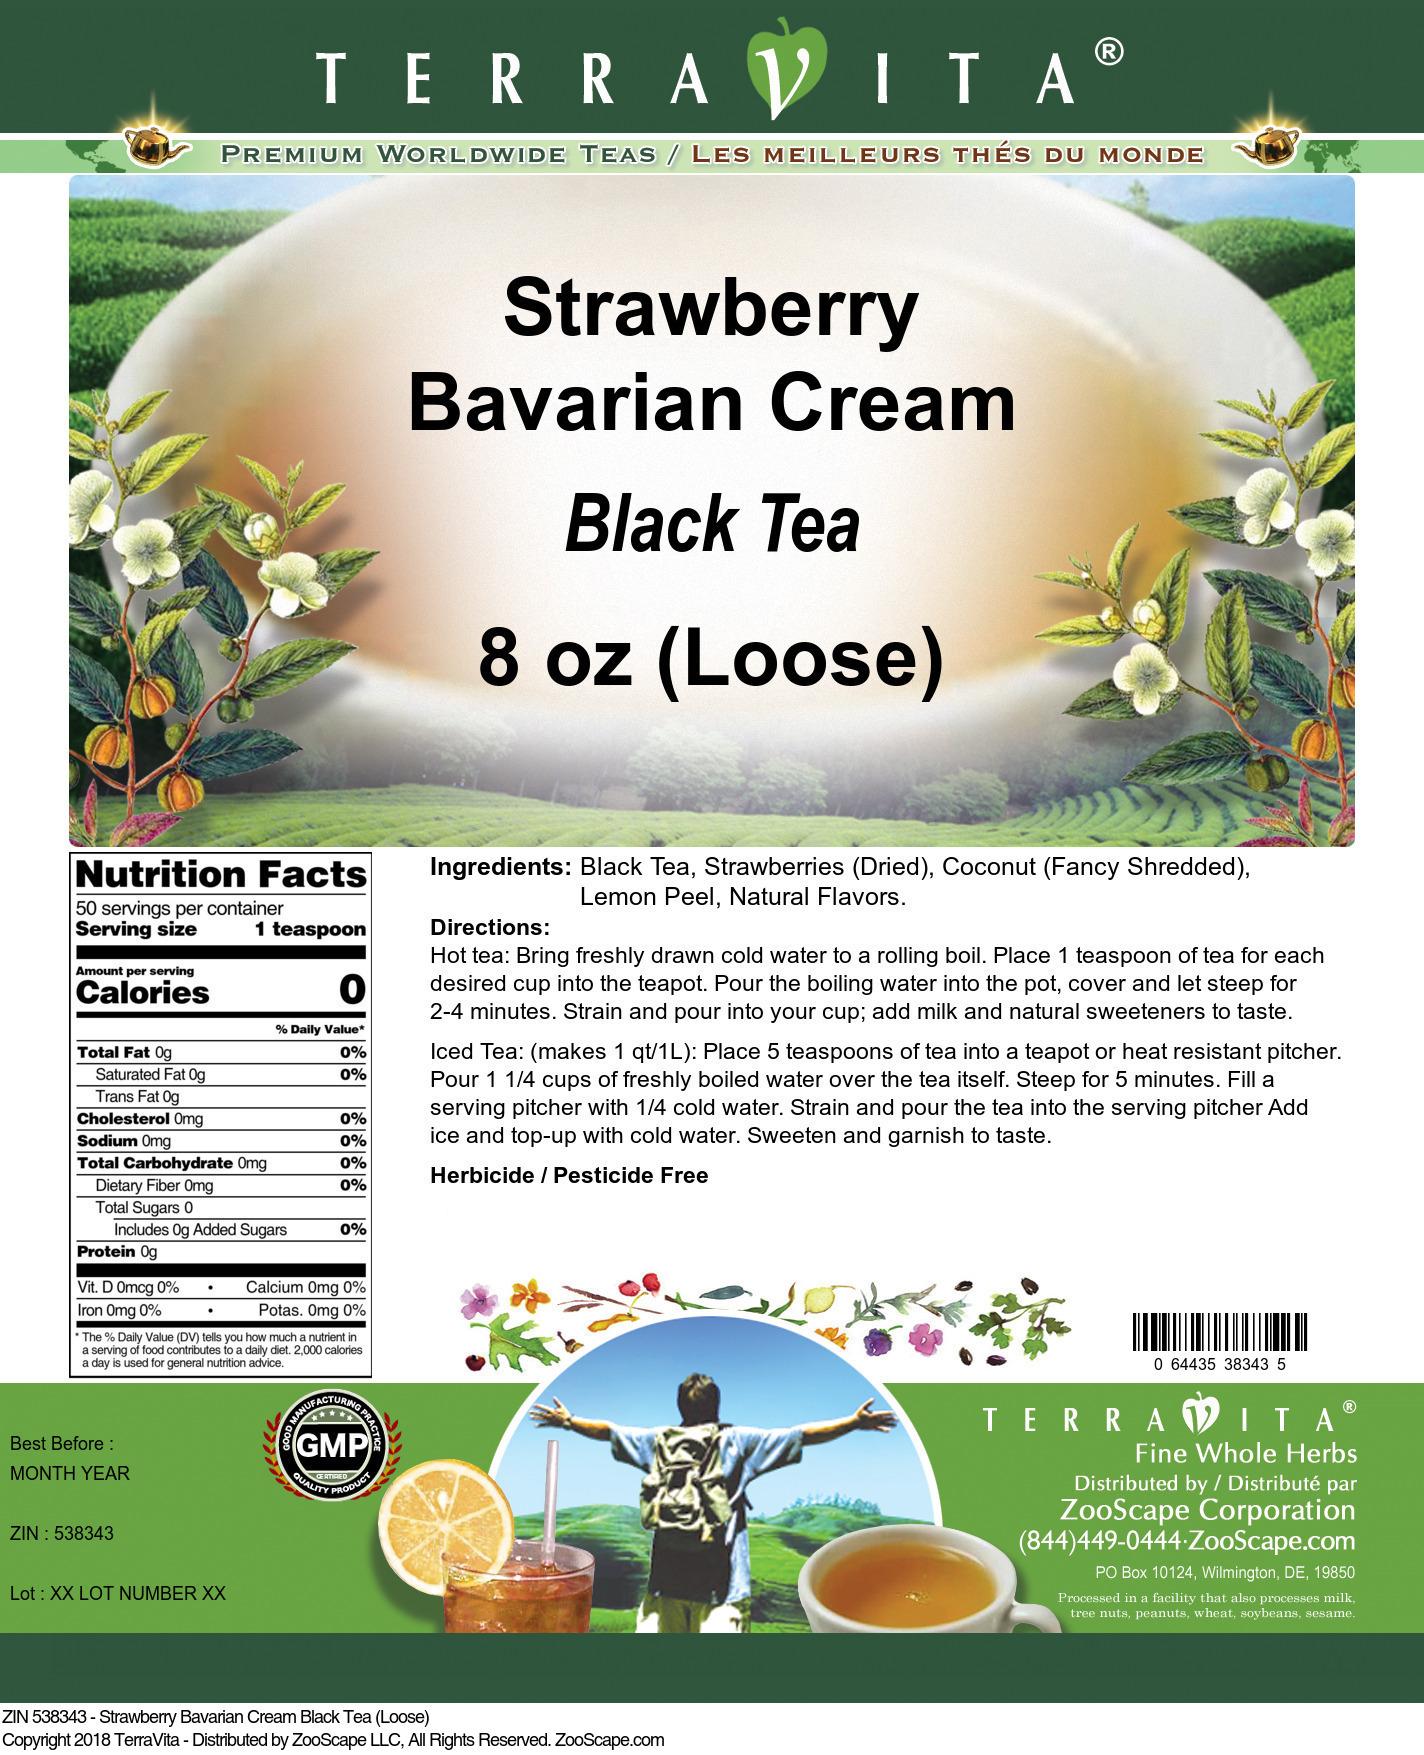 Strawberry Bavarian Cream Black Tea